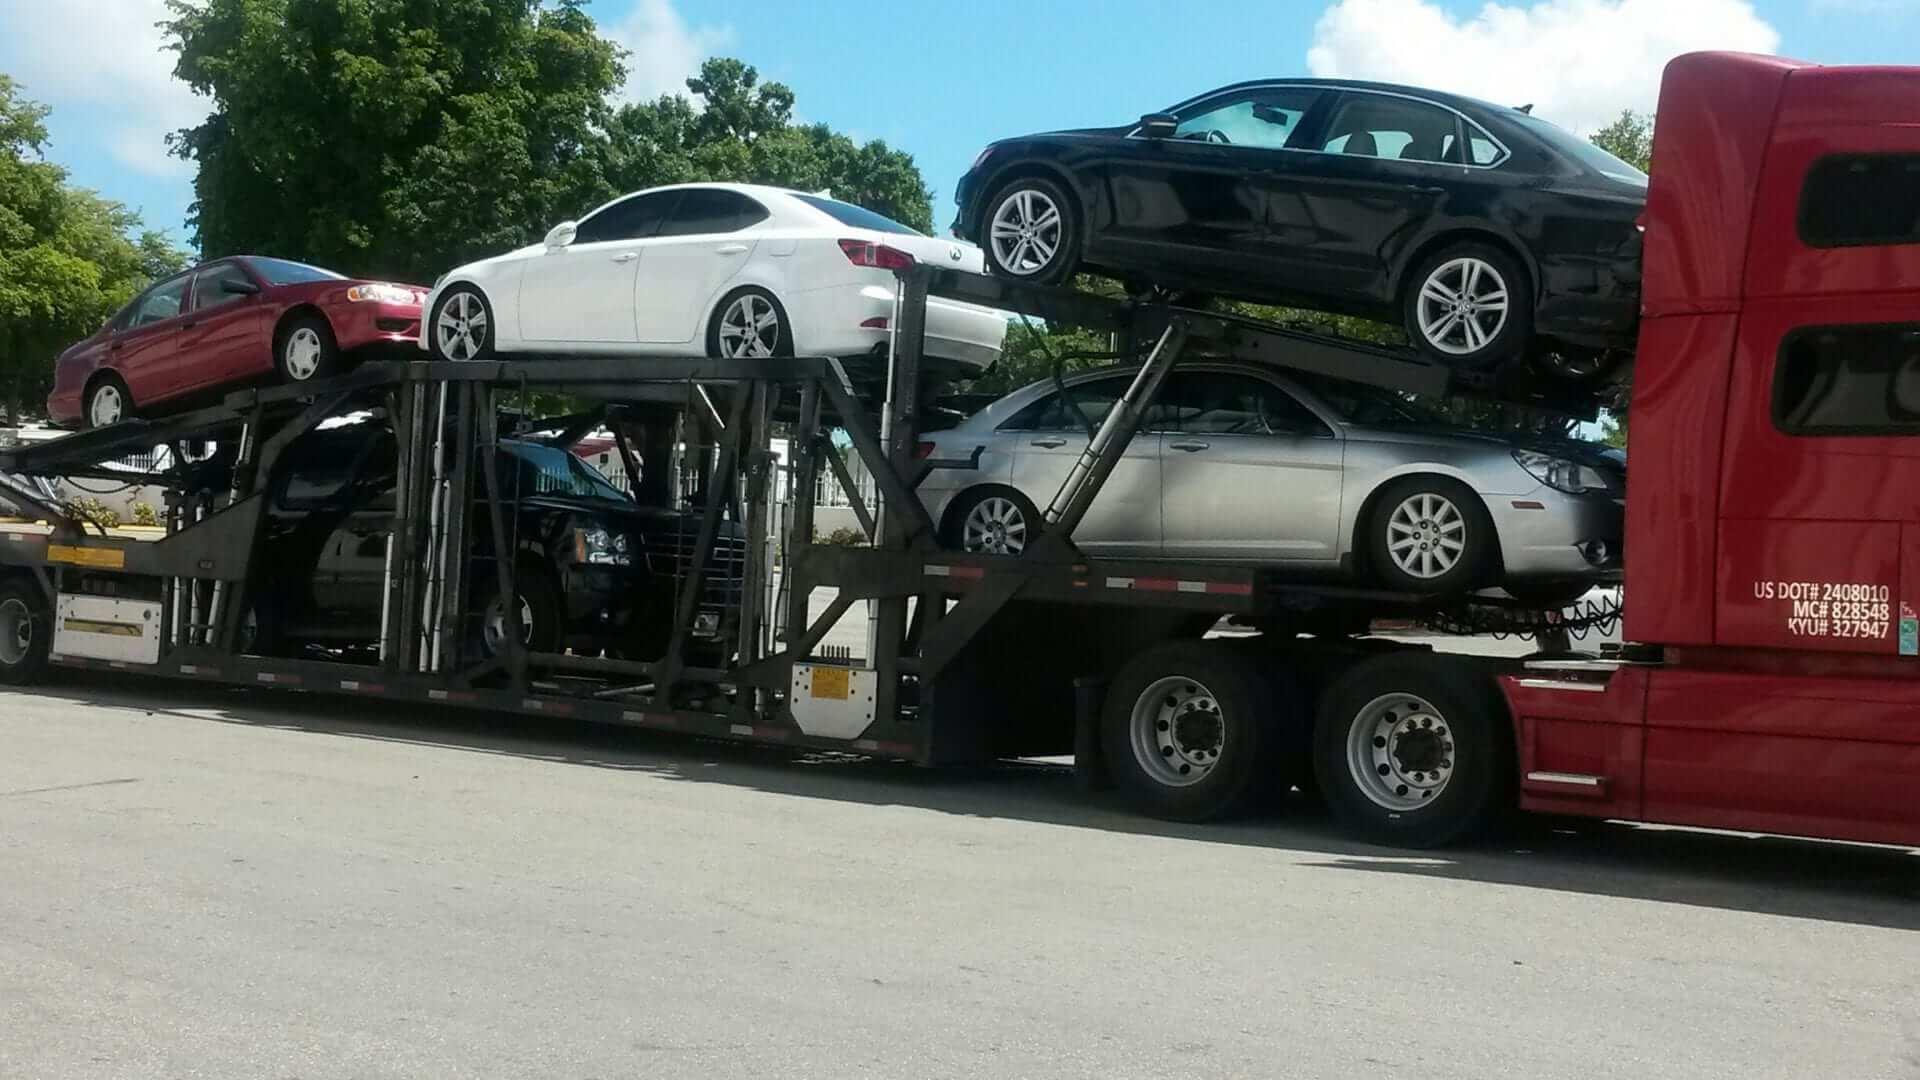 door service transport to vs terminal aa car